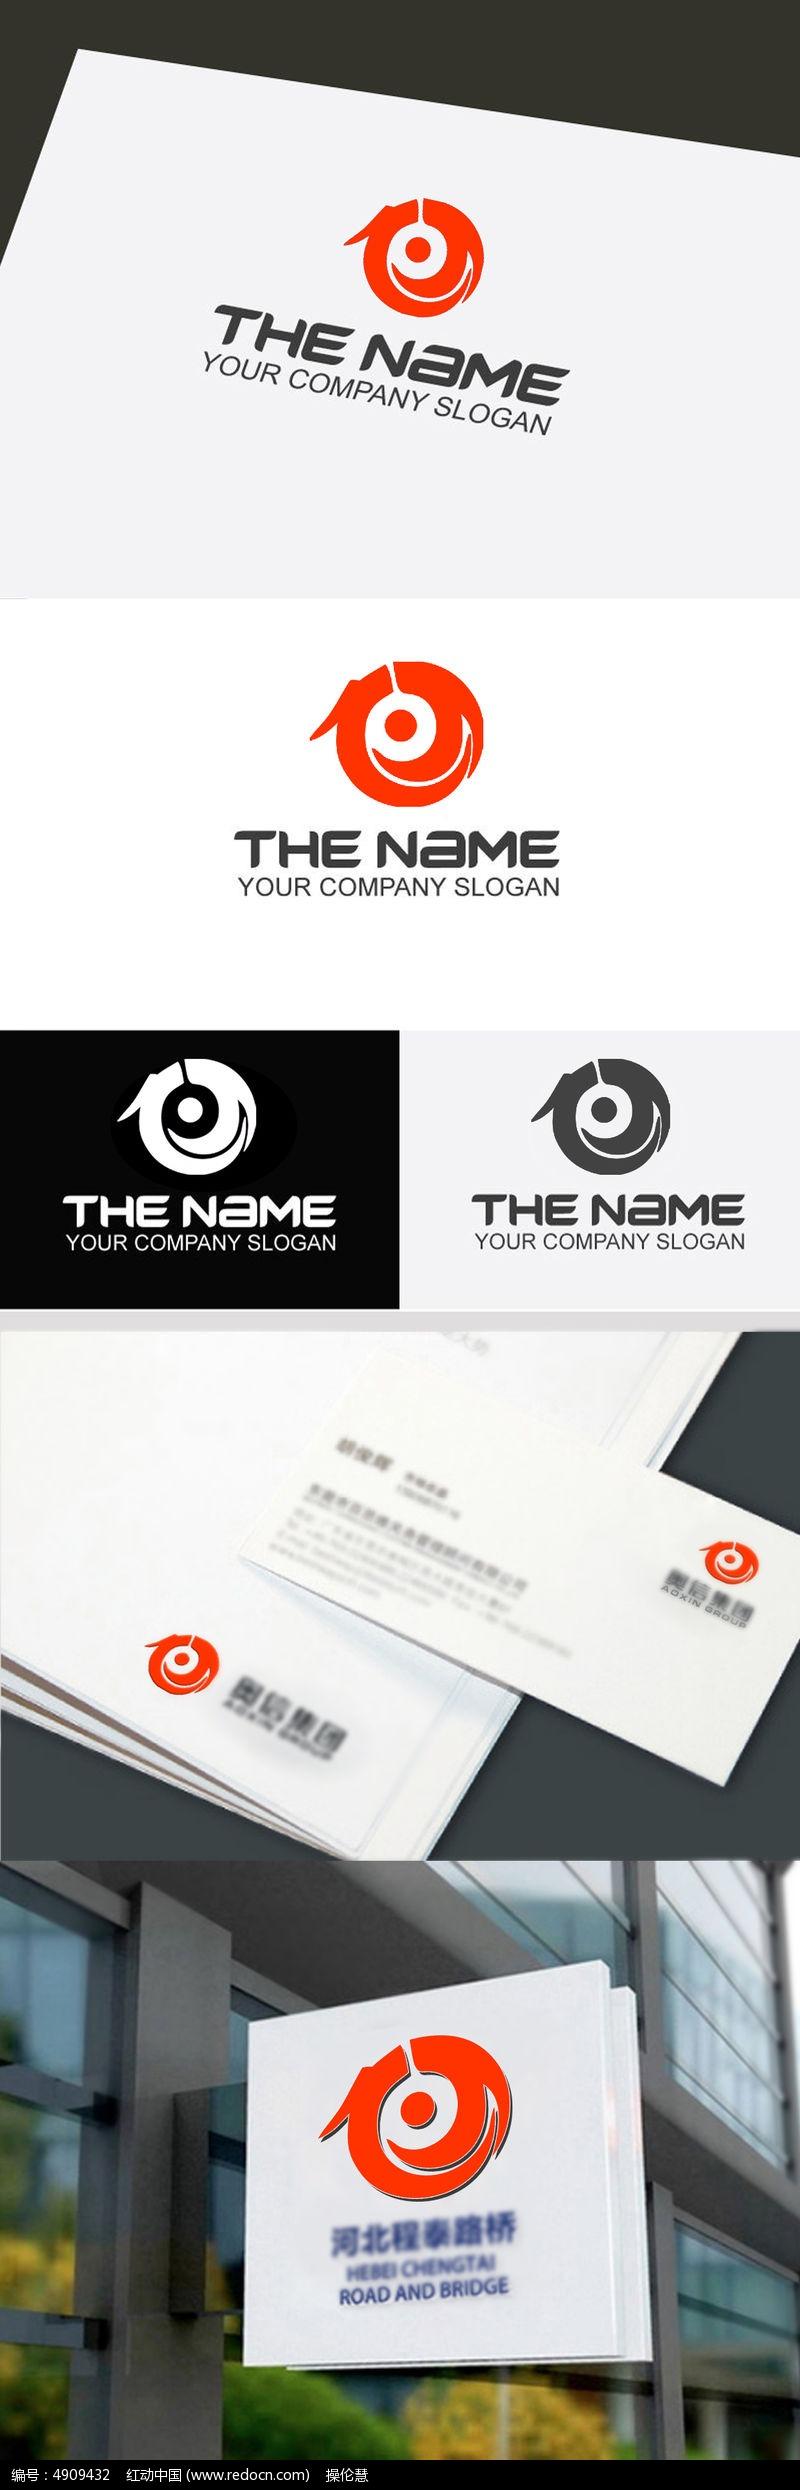 企业logm�'h�_logo 圆形logo 企业logo 公司logo 商业logo 商业服务logo 红色logo